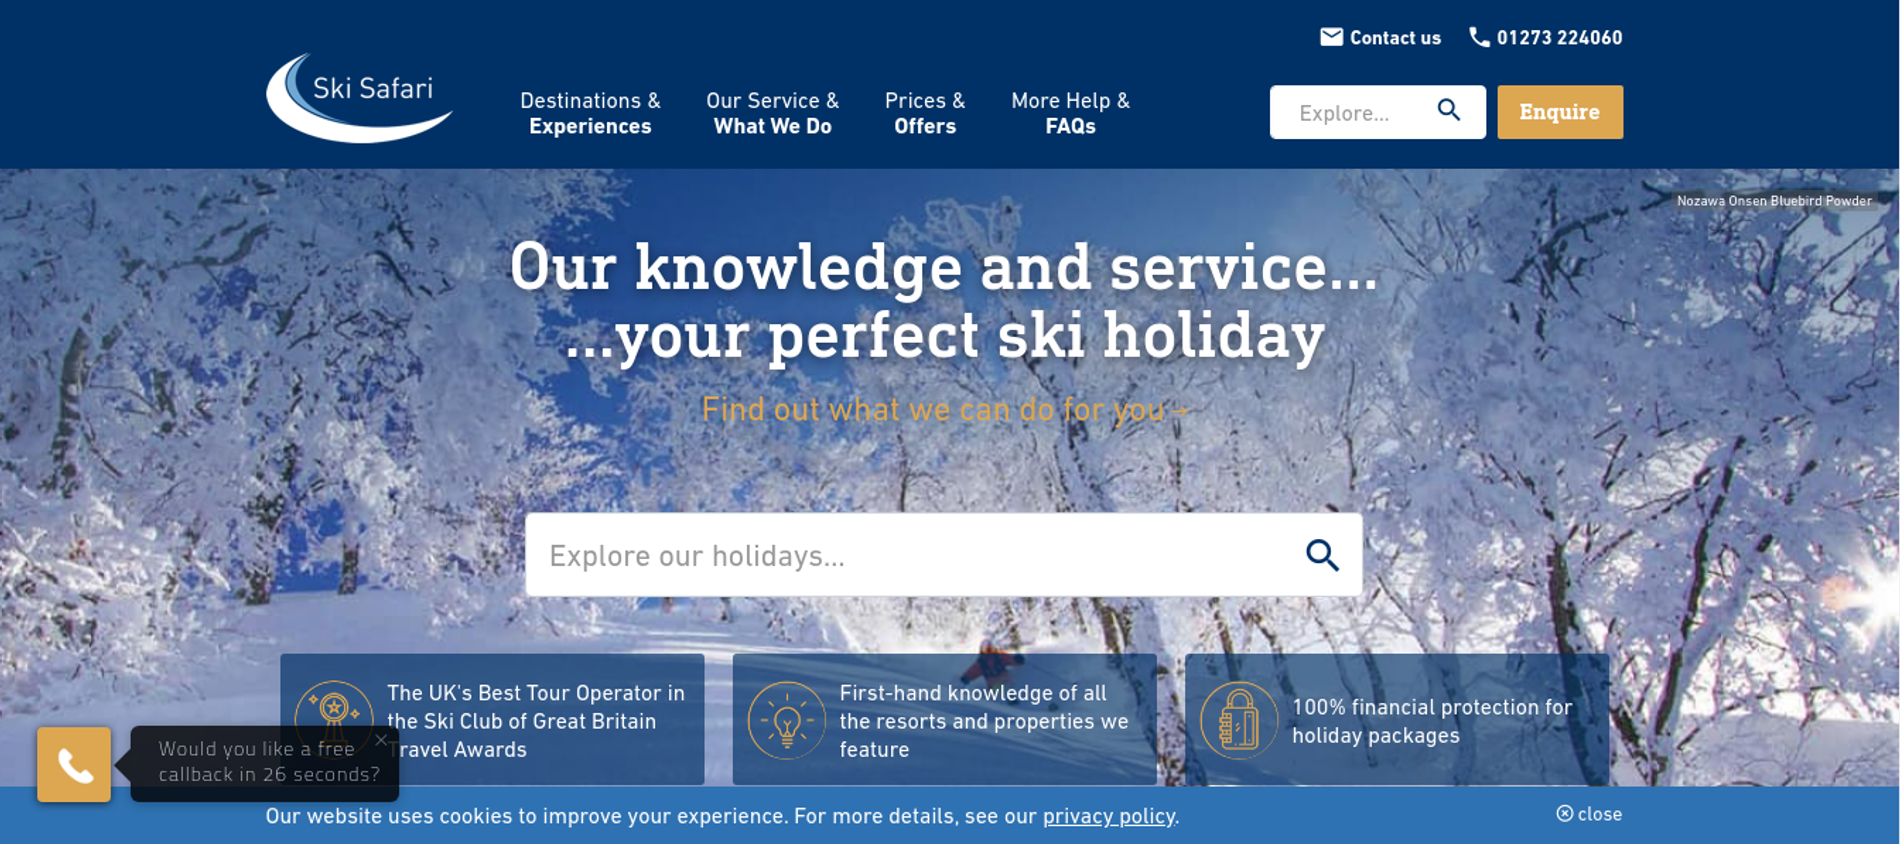 Ski Safari website screenshot